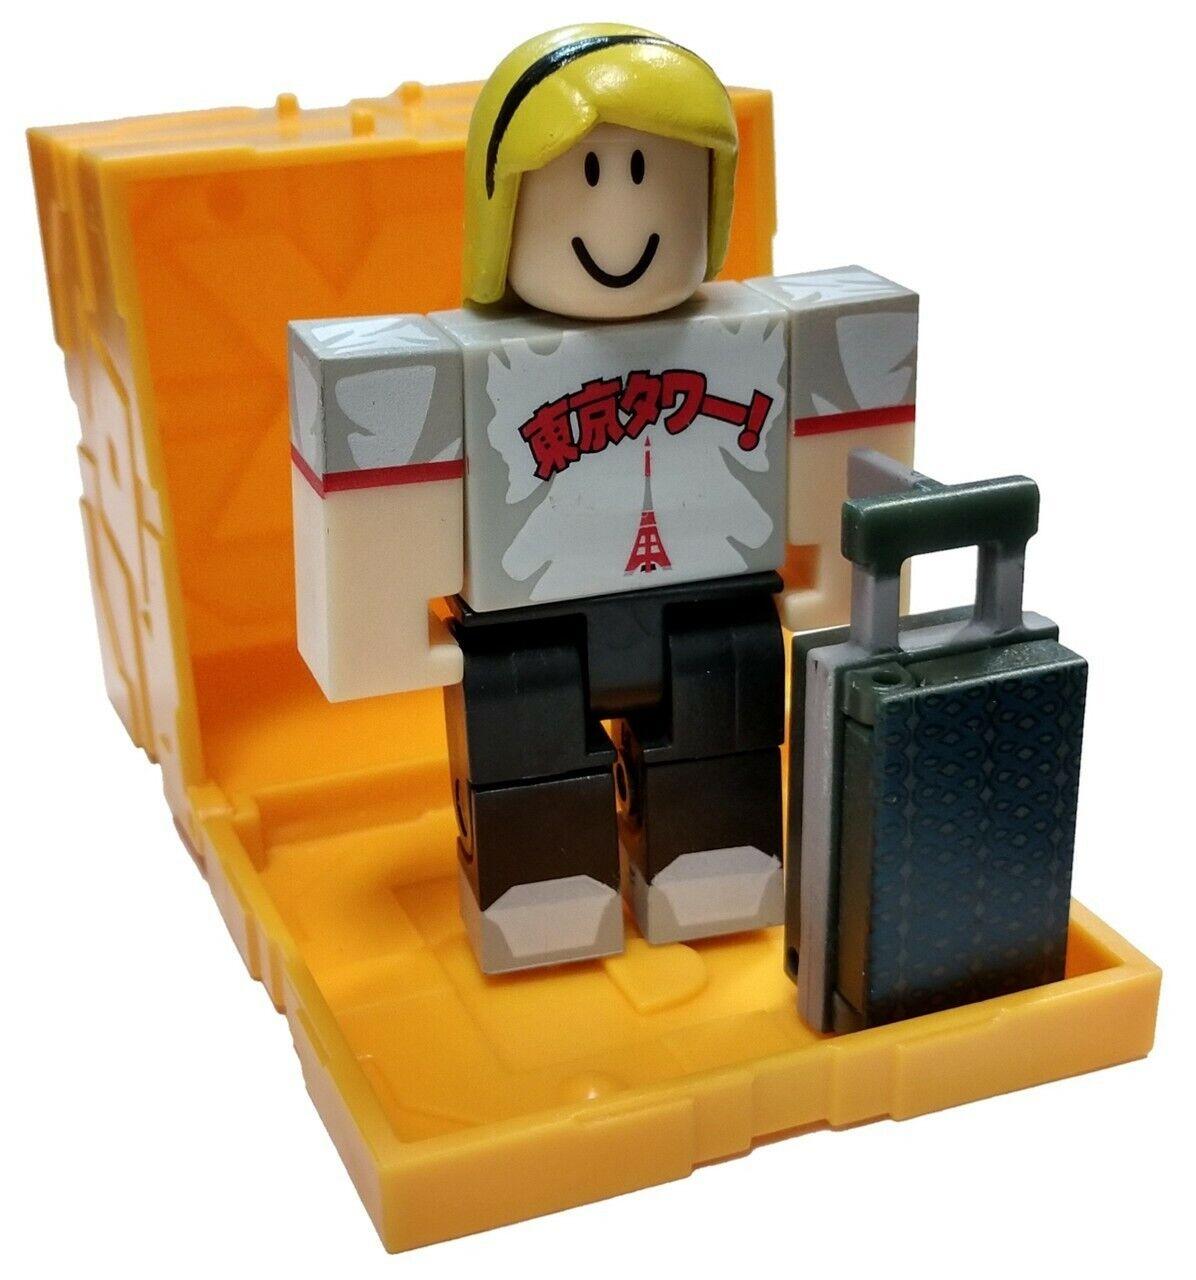 Roblox Figure Pack Assortment Gamestop Roblox Toys Series 3